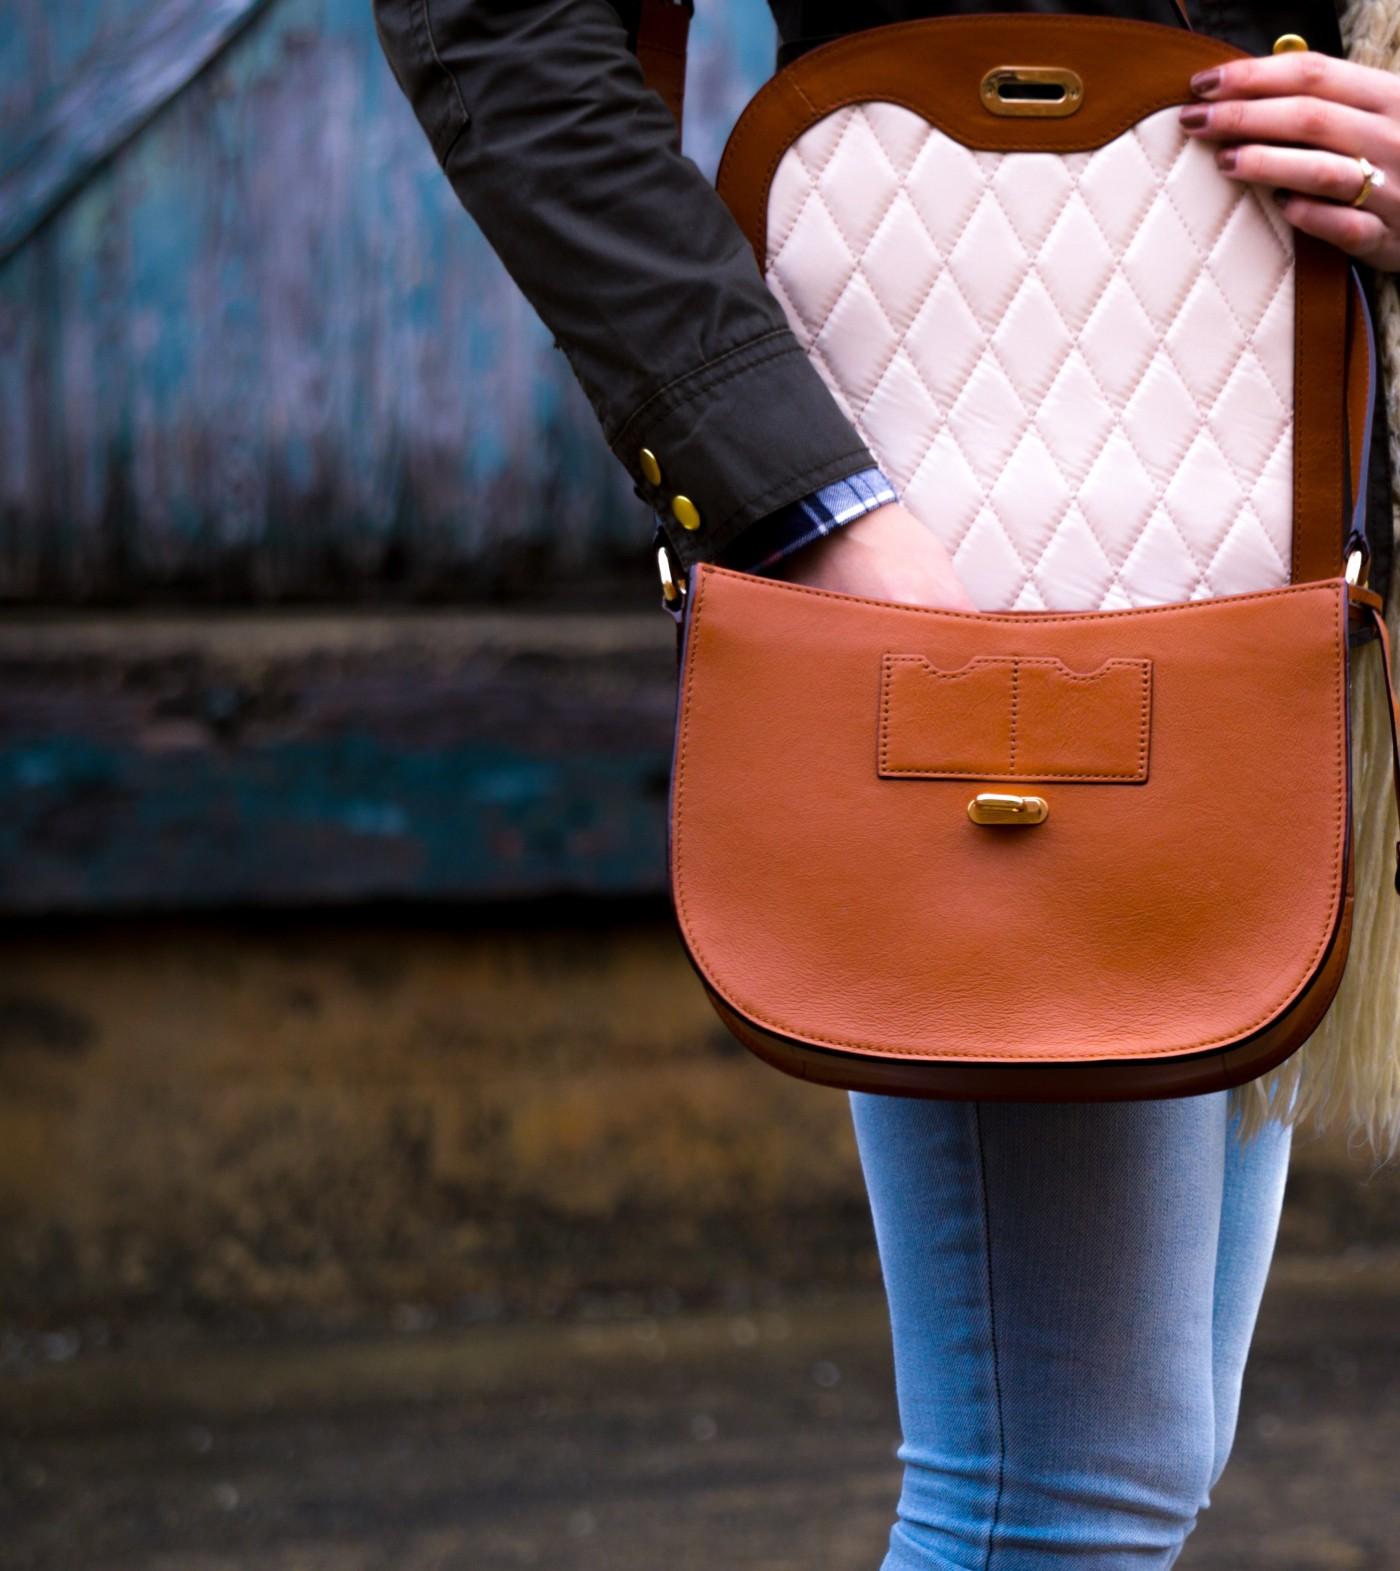 New and preloved designer bags under £3000